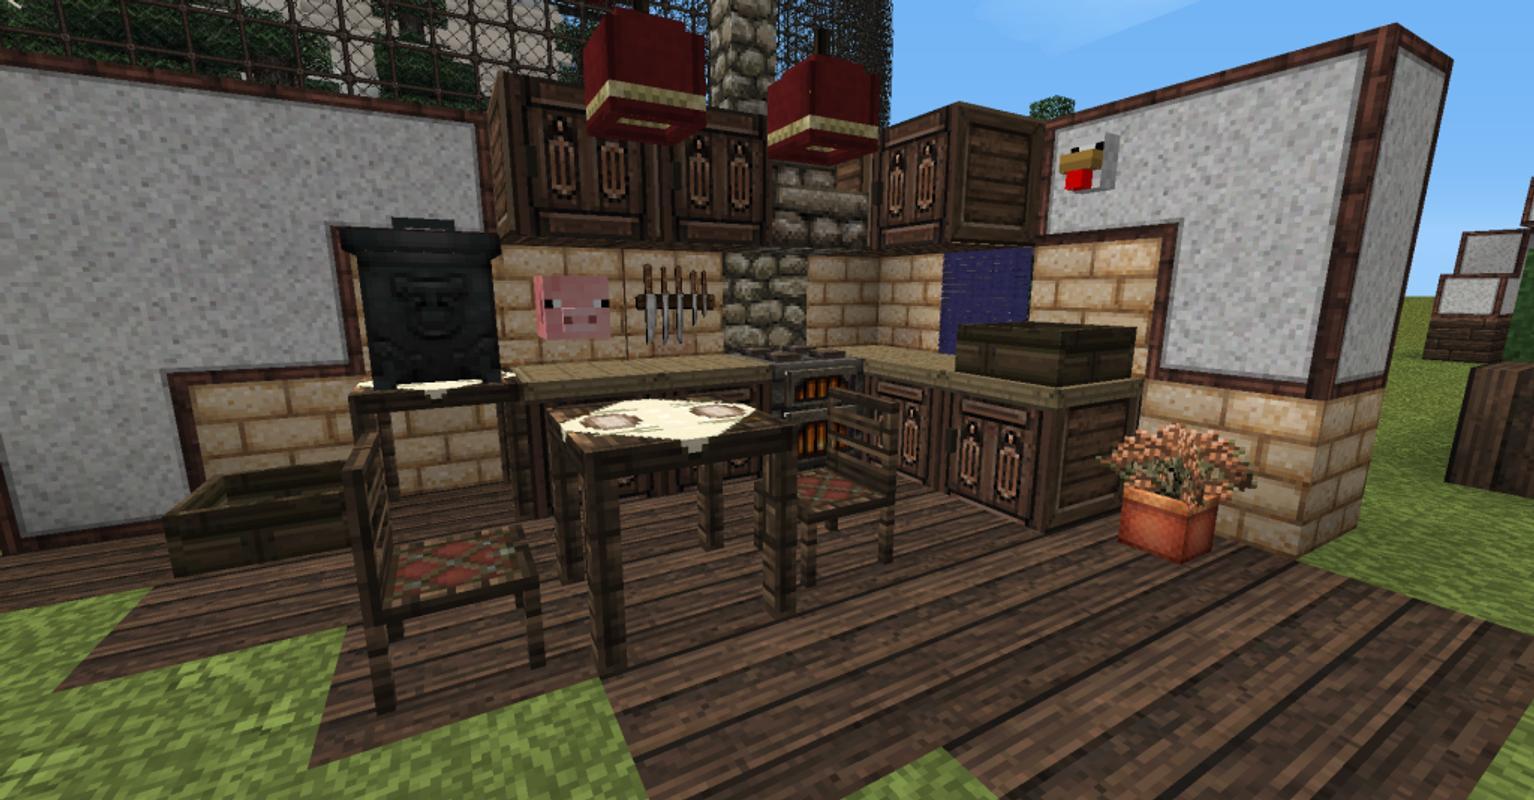 моды на майнкрафт мебель 1.7.2 #10